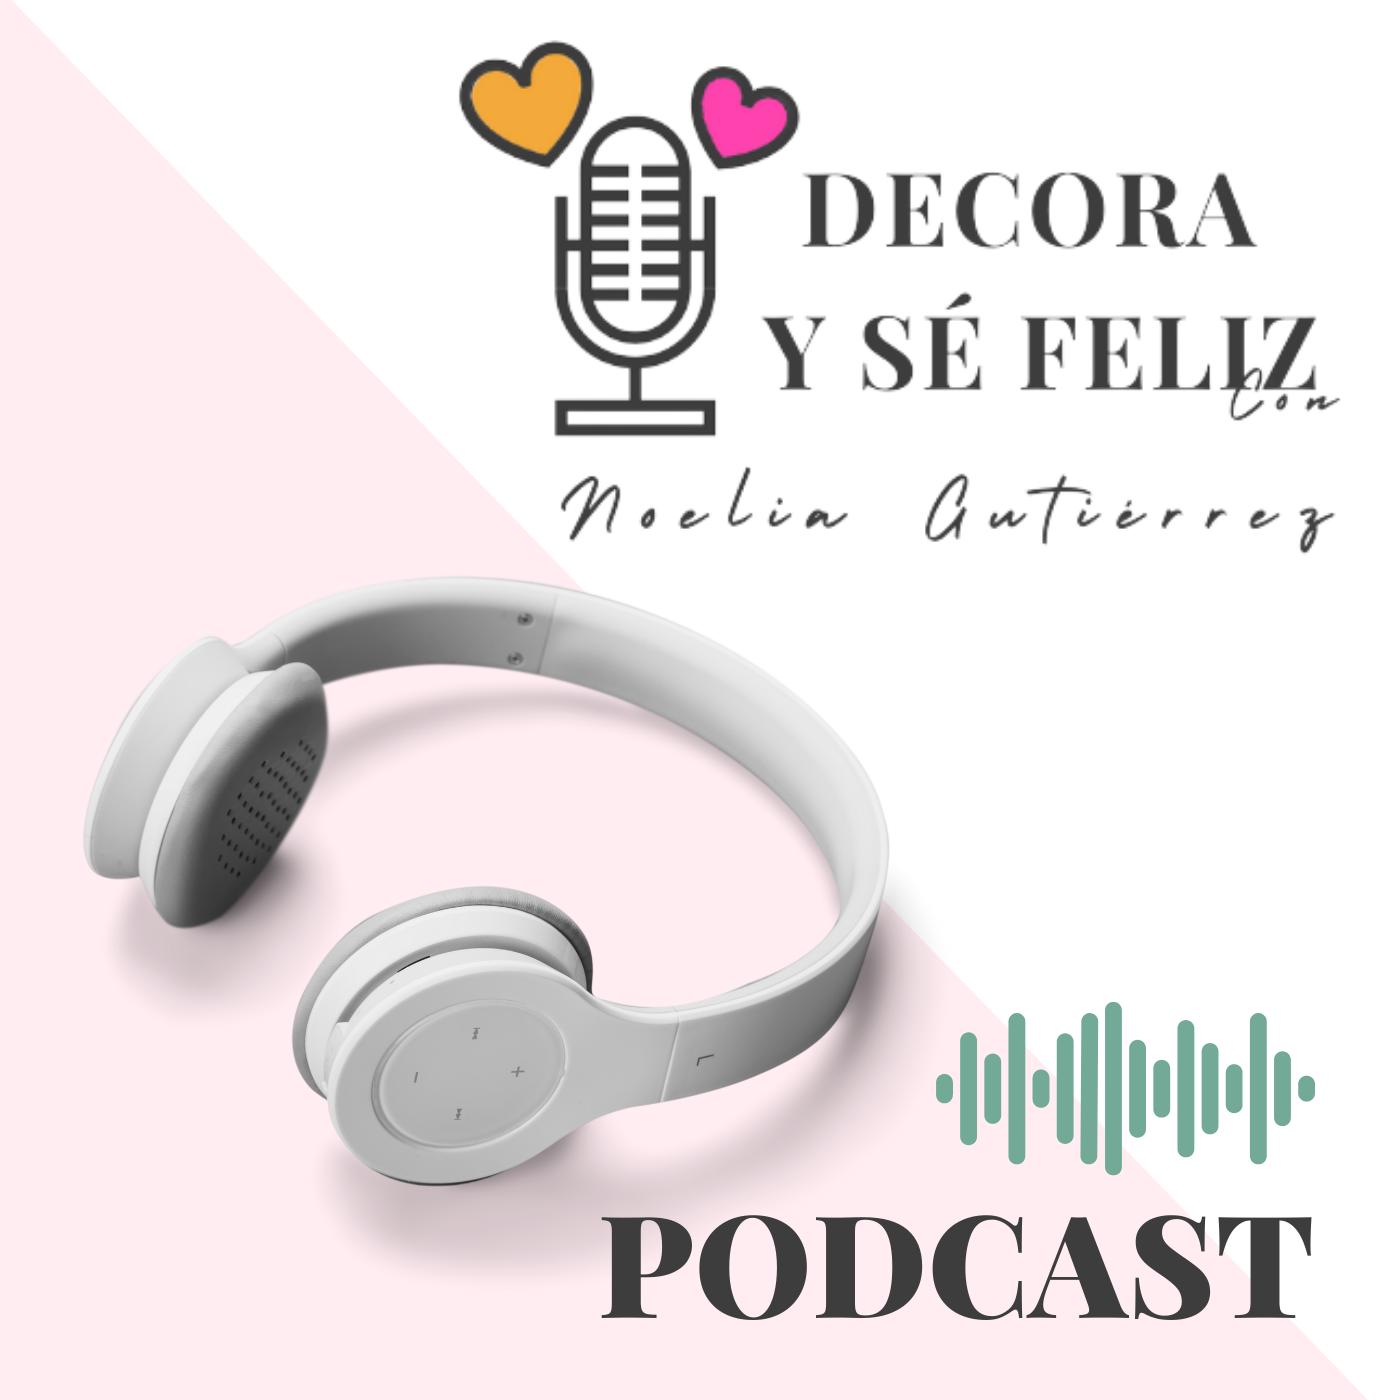 podcast-decora-se-feliz-noelia=unik-designs-decoracion-emocional